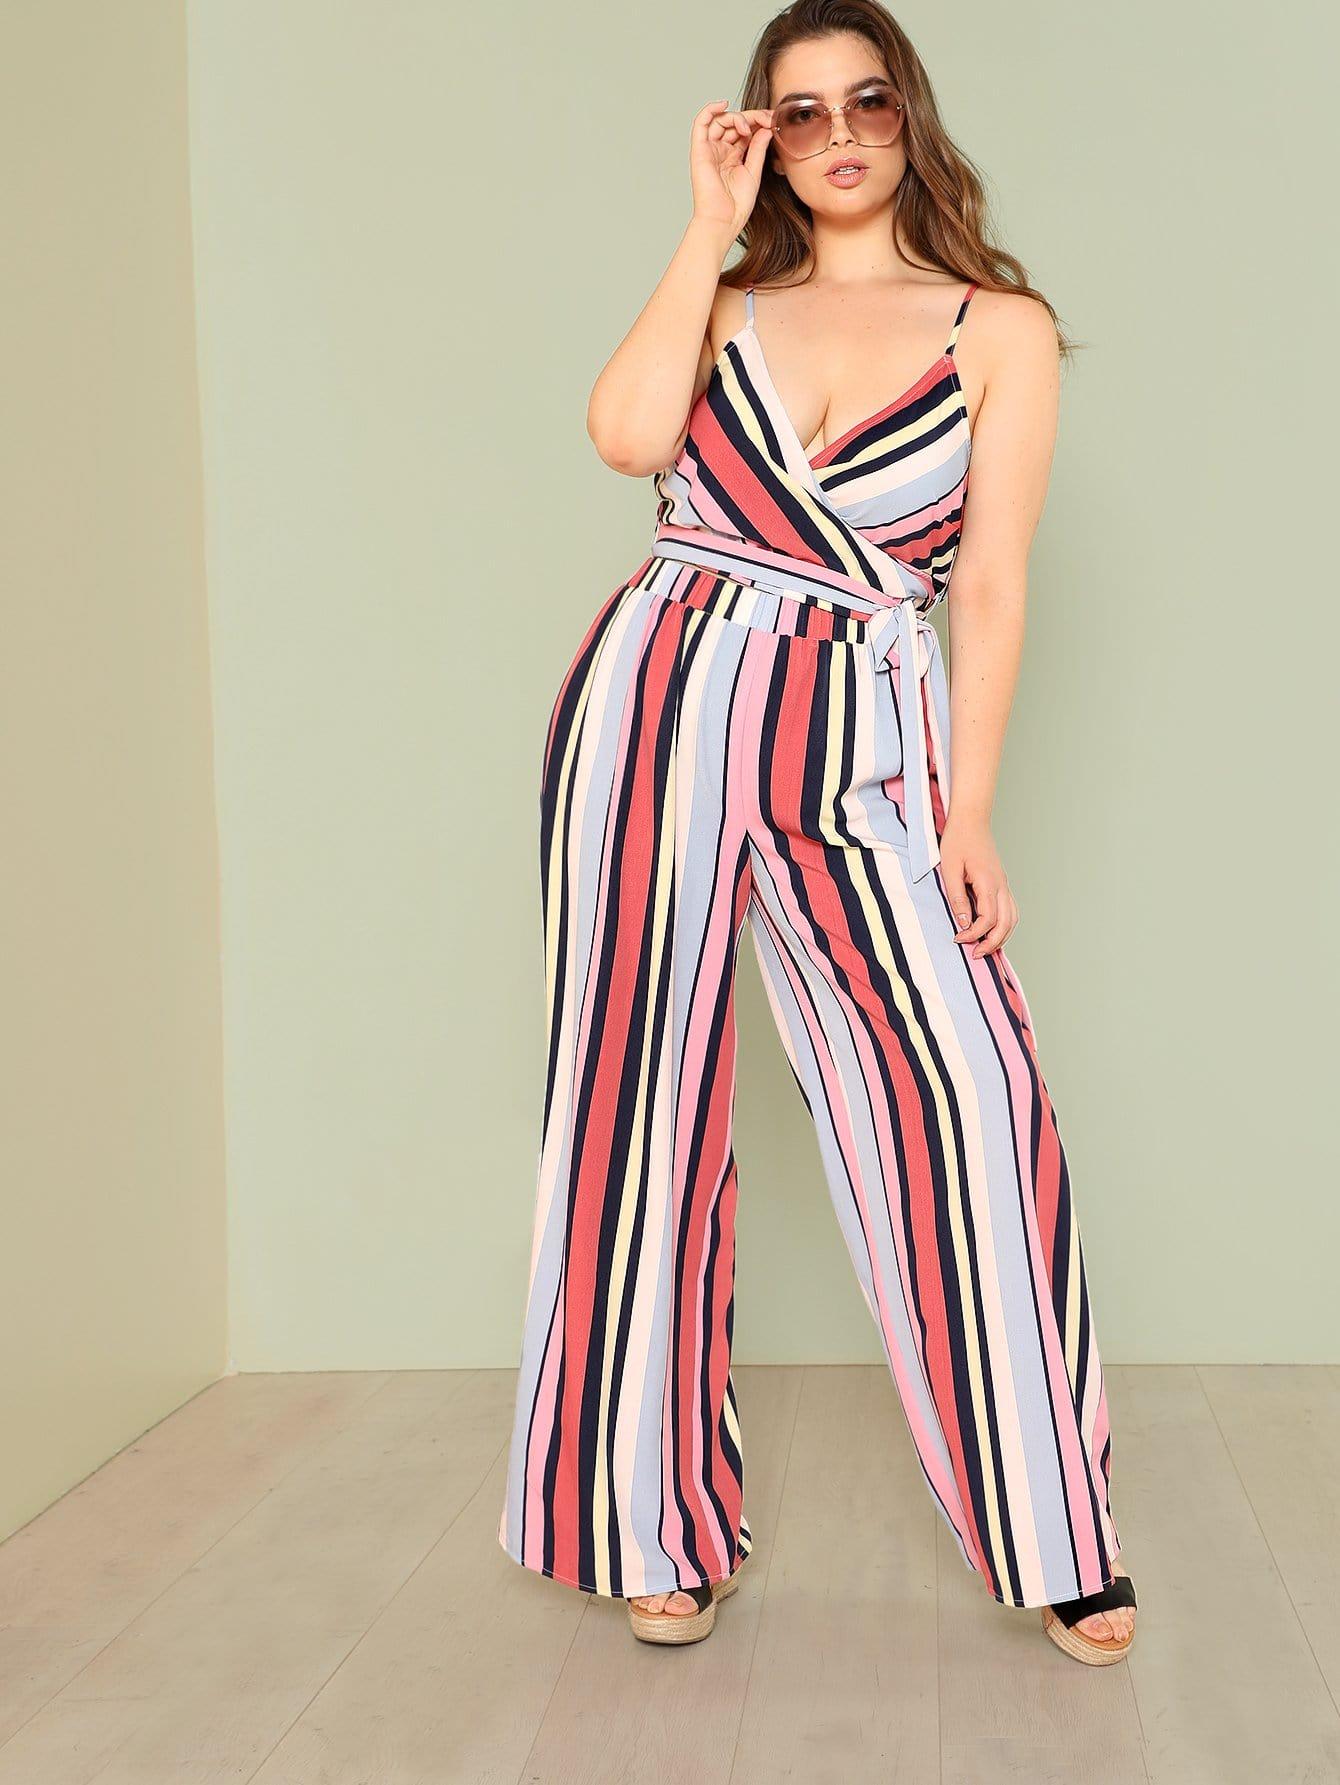 Plus Surplice Neck Striped Cami Top & Culotte Pants Set surplice neck ribbed cami top